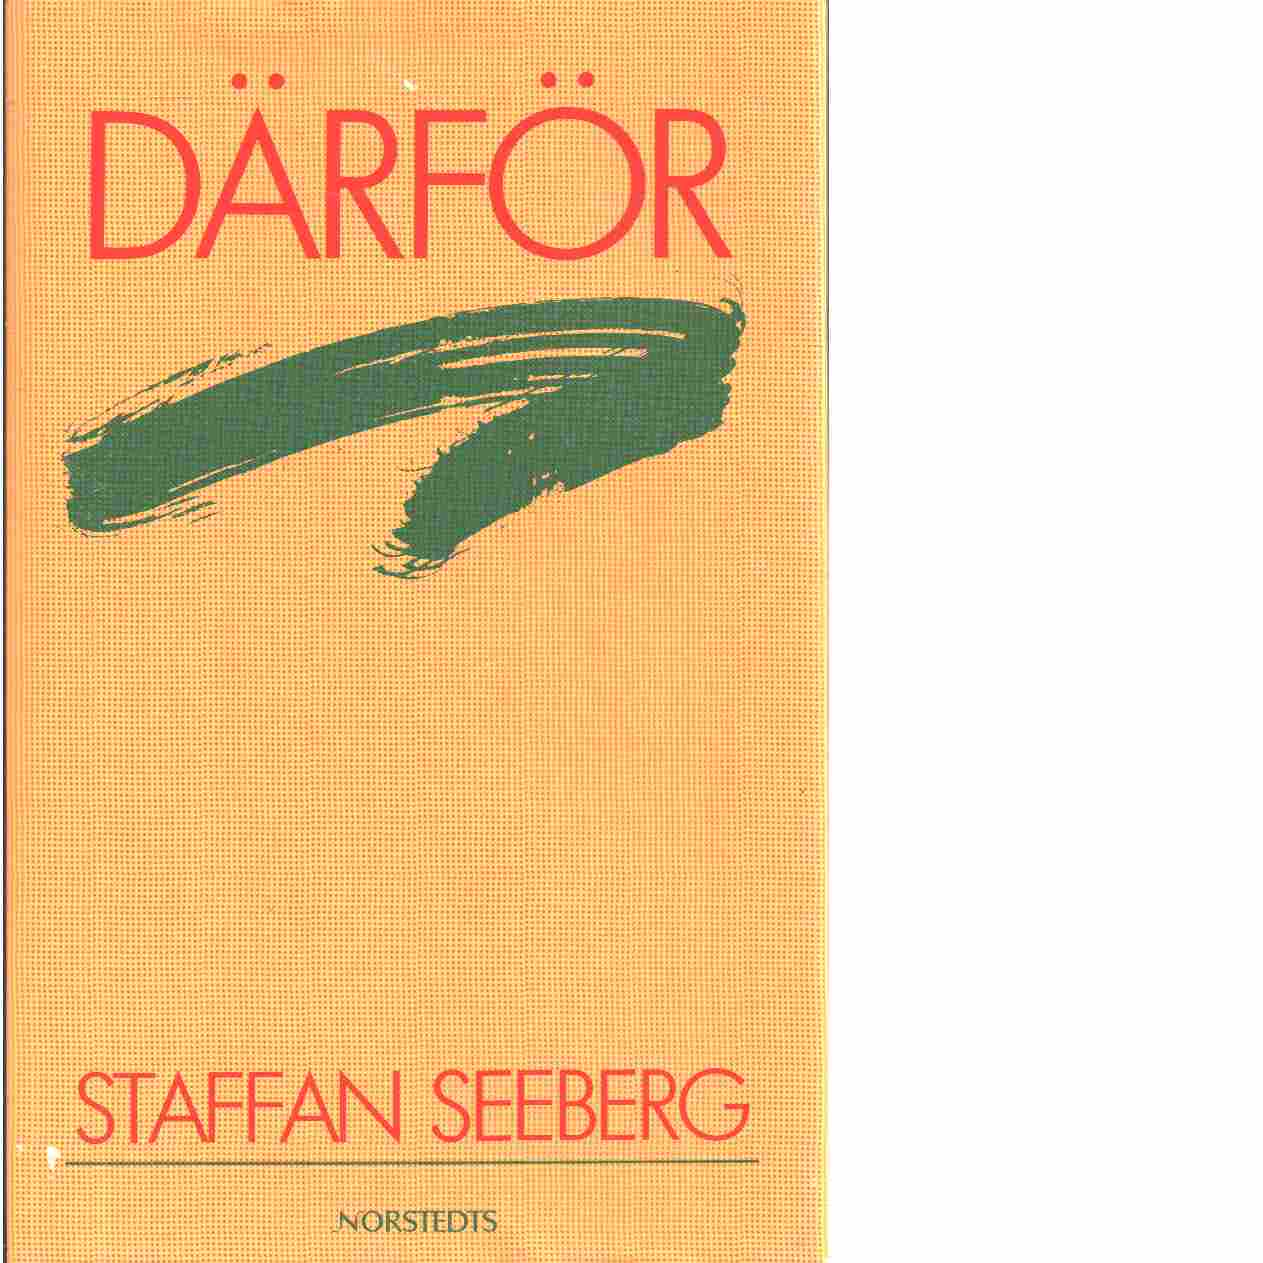 Därför - Seeberg, Staffan